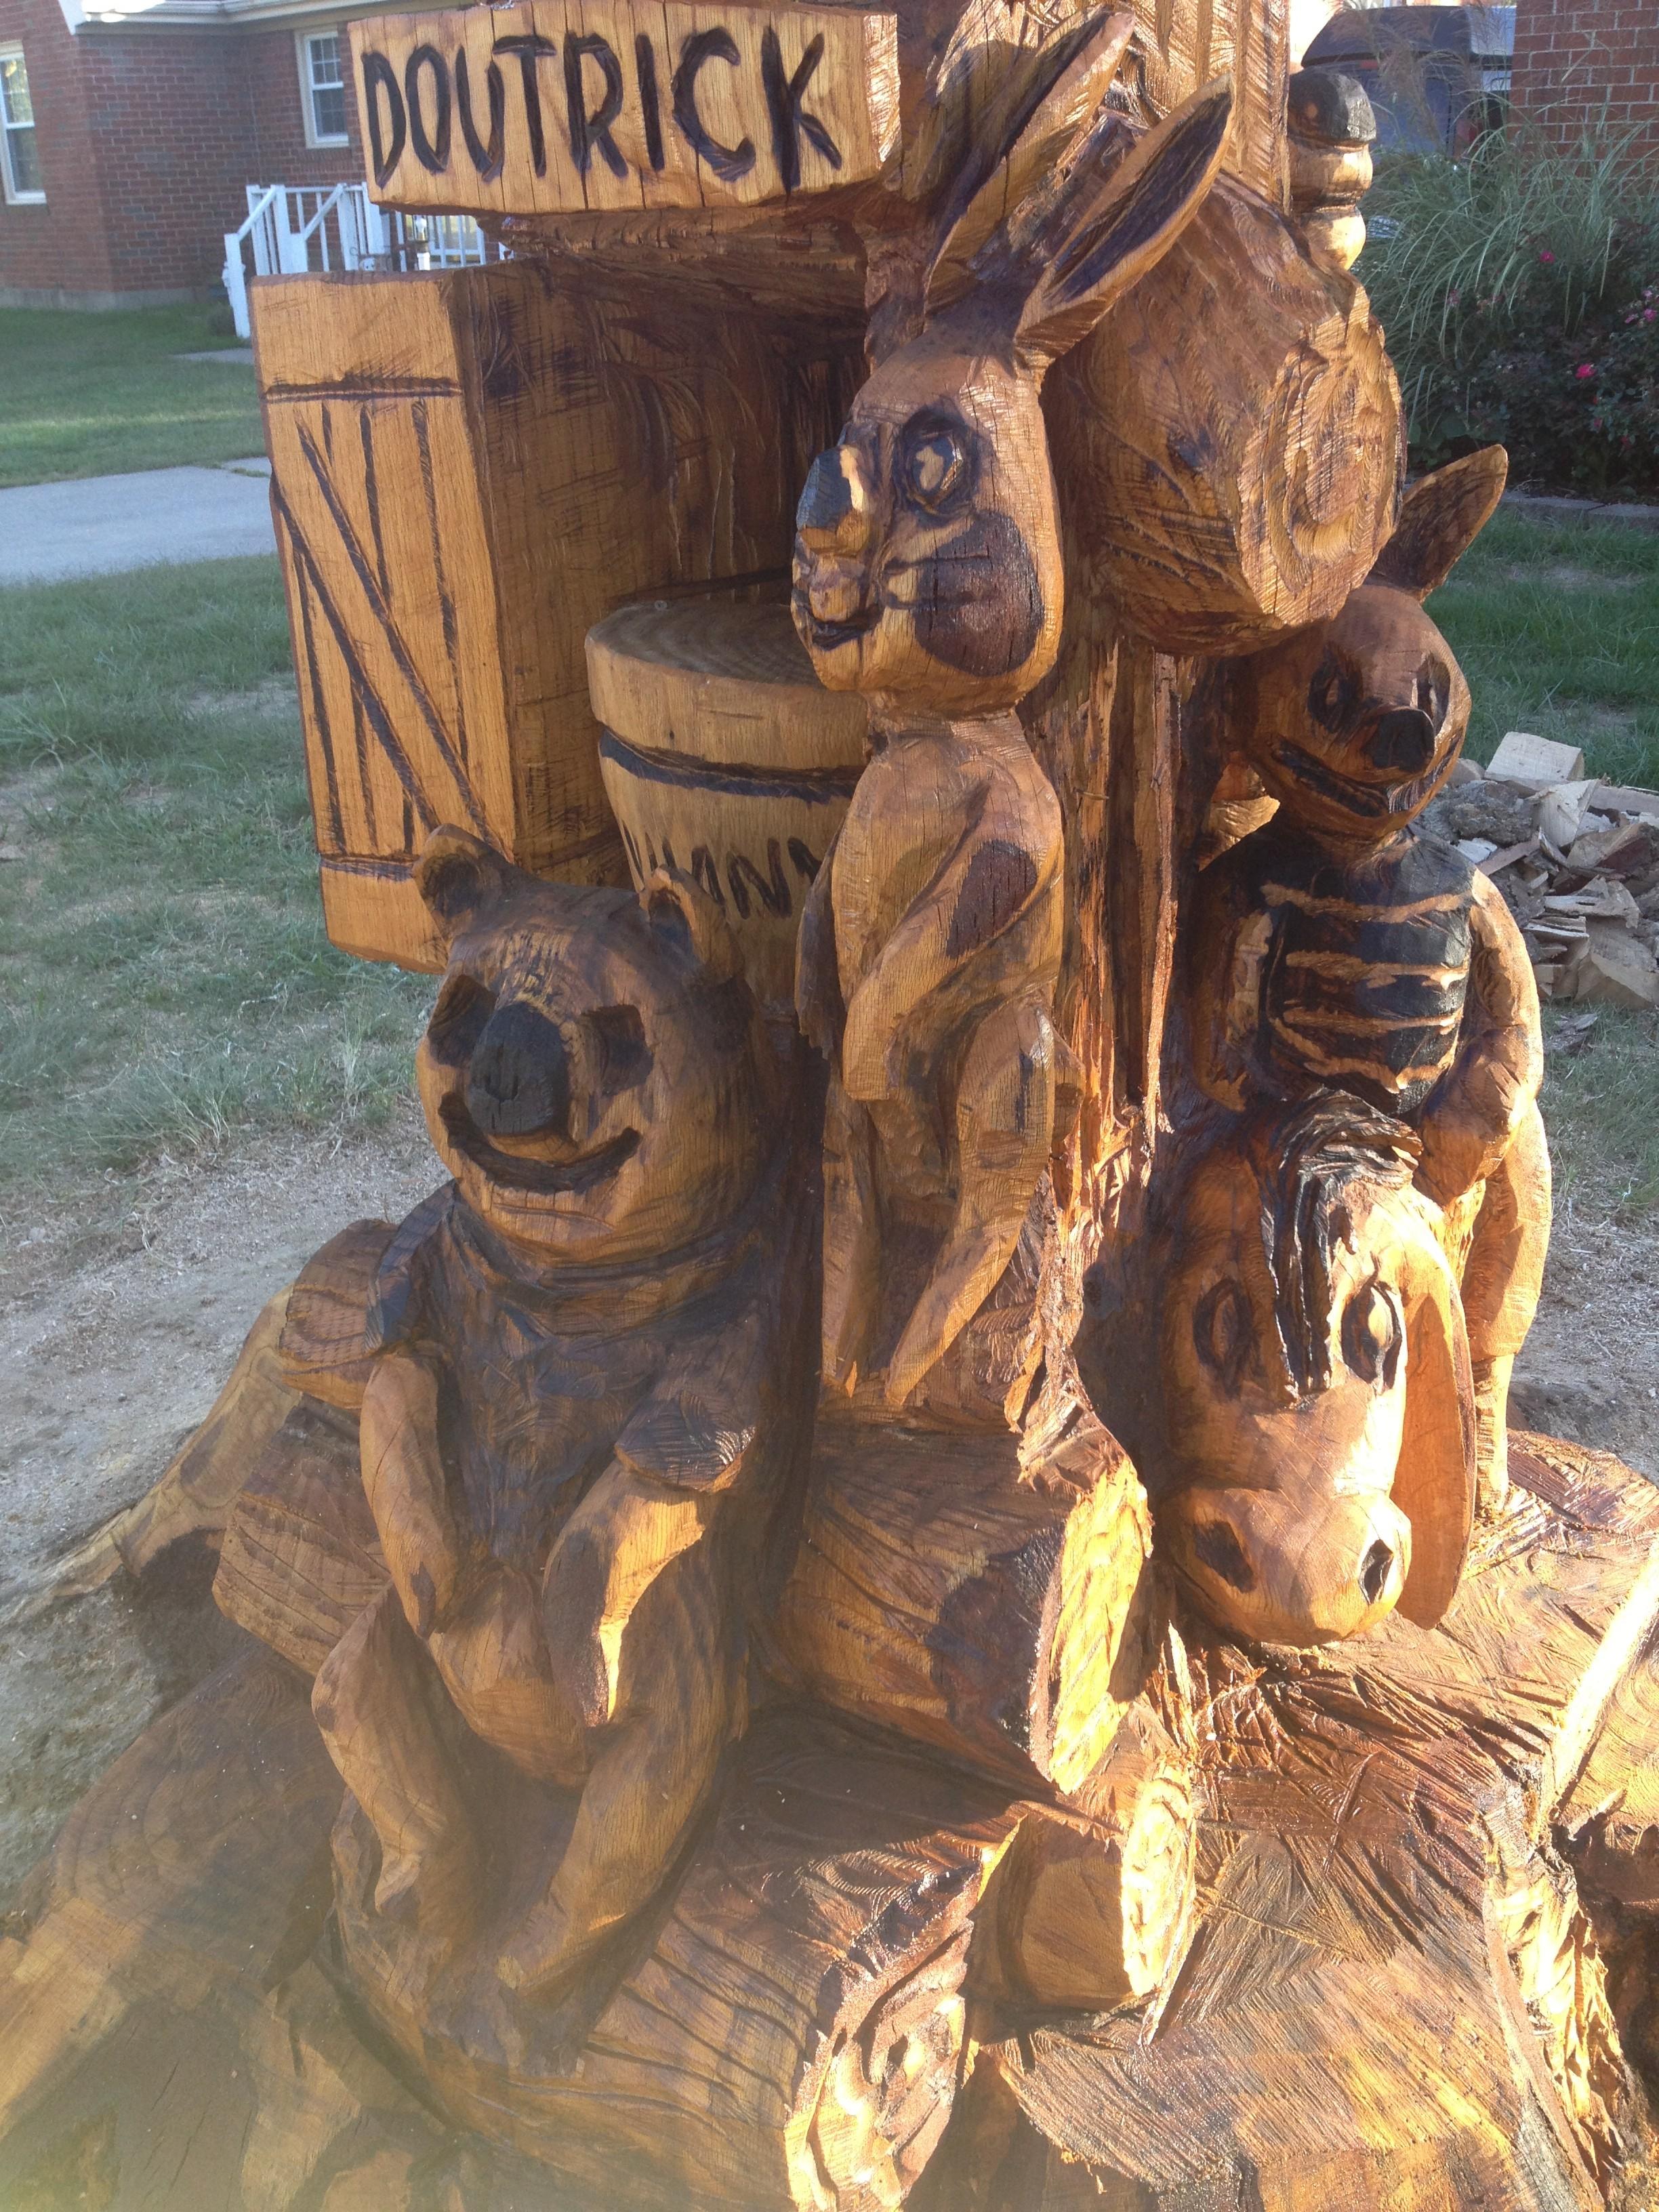 Roark phillips chainsaw carving stump carving artist sculpture